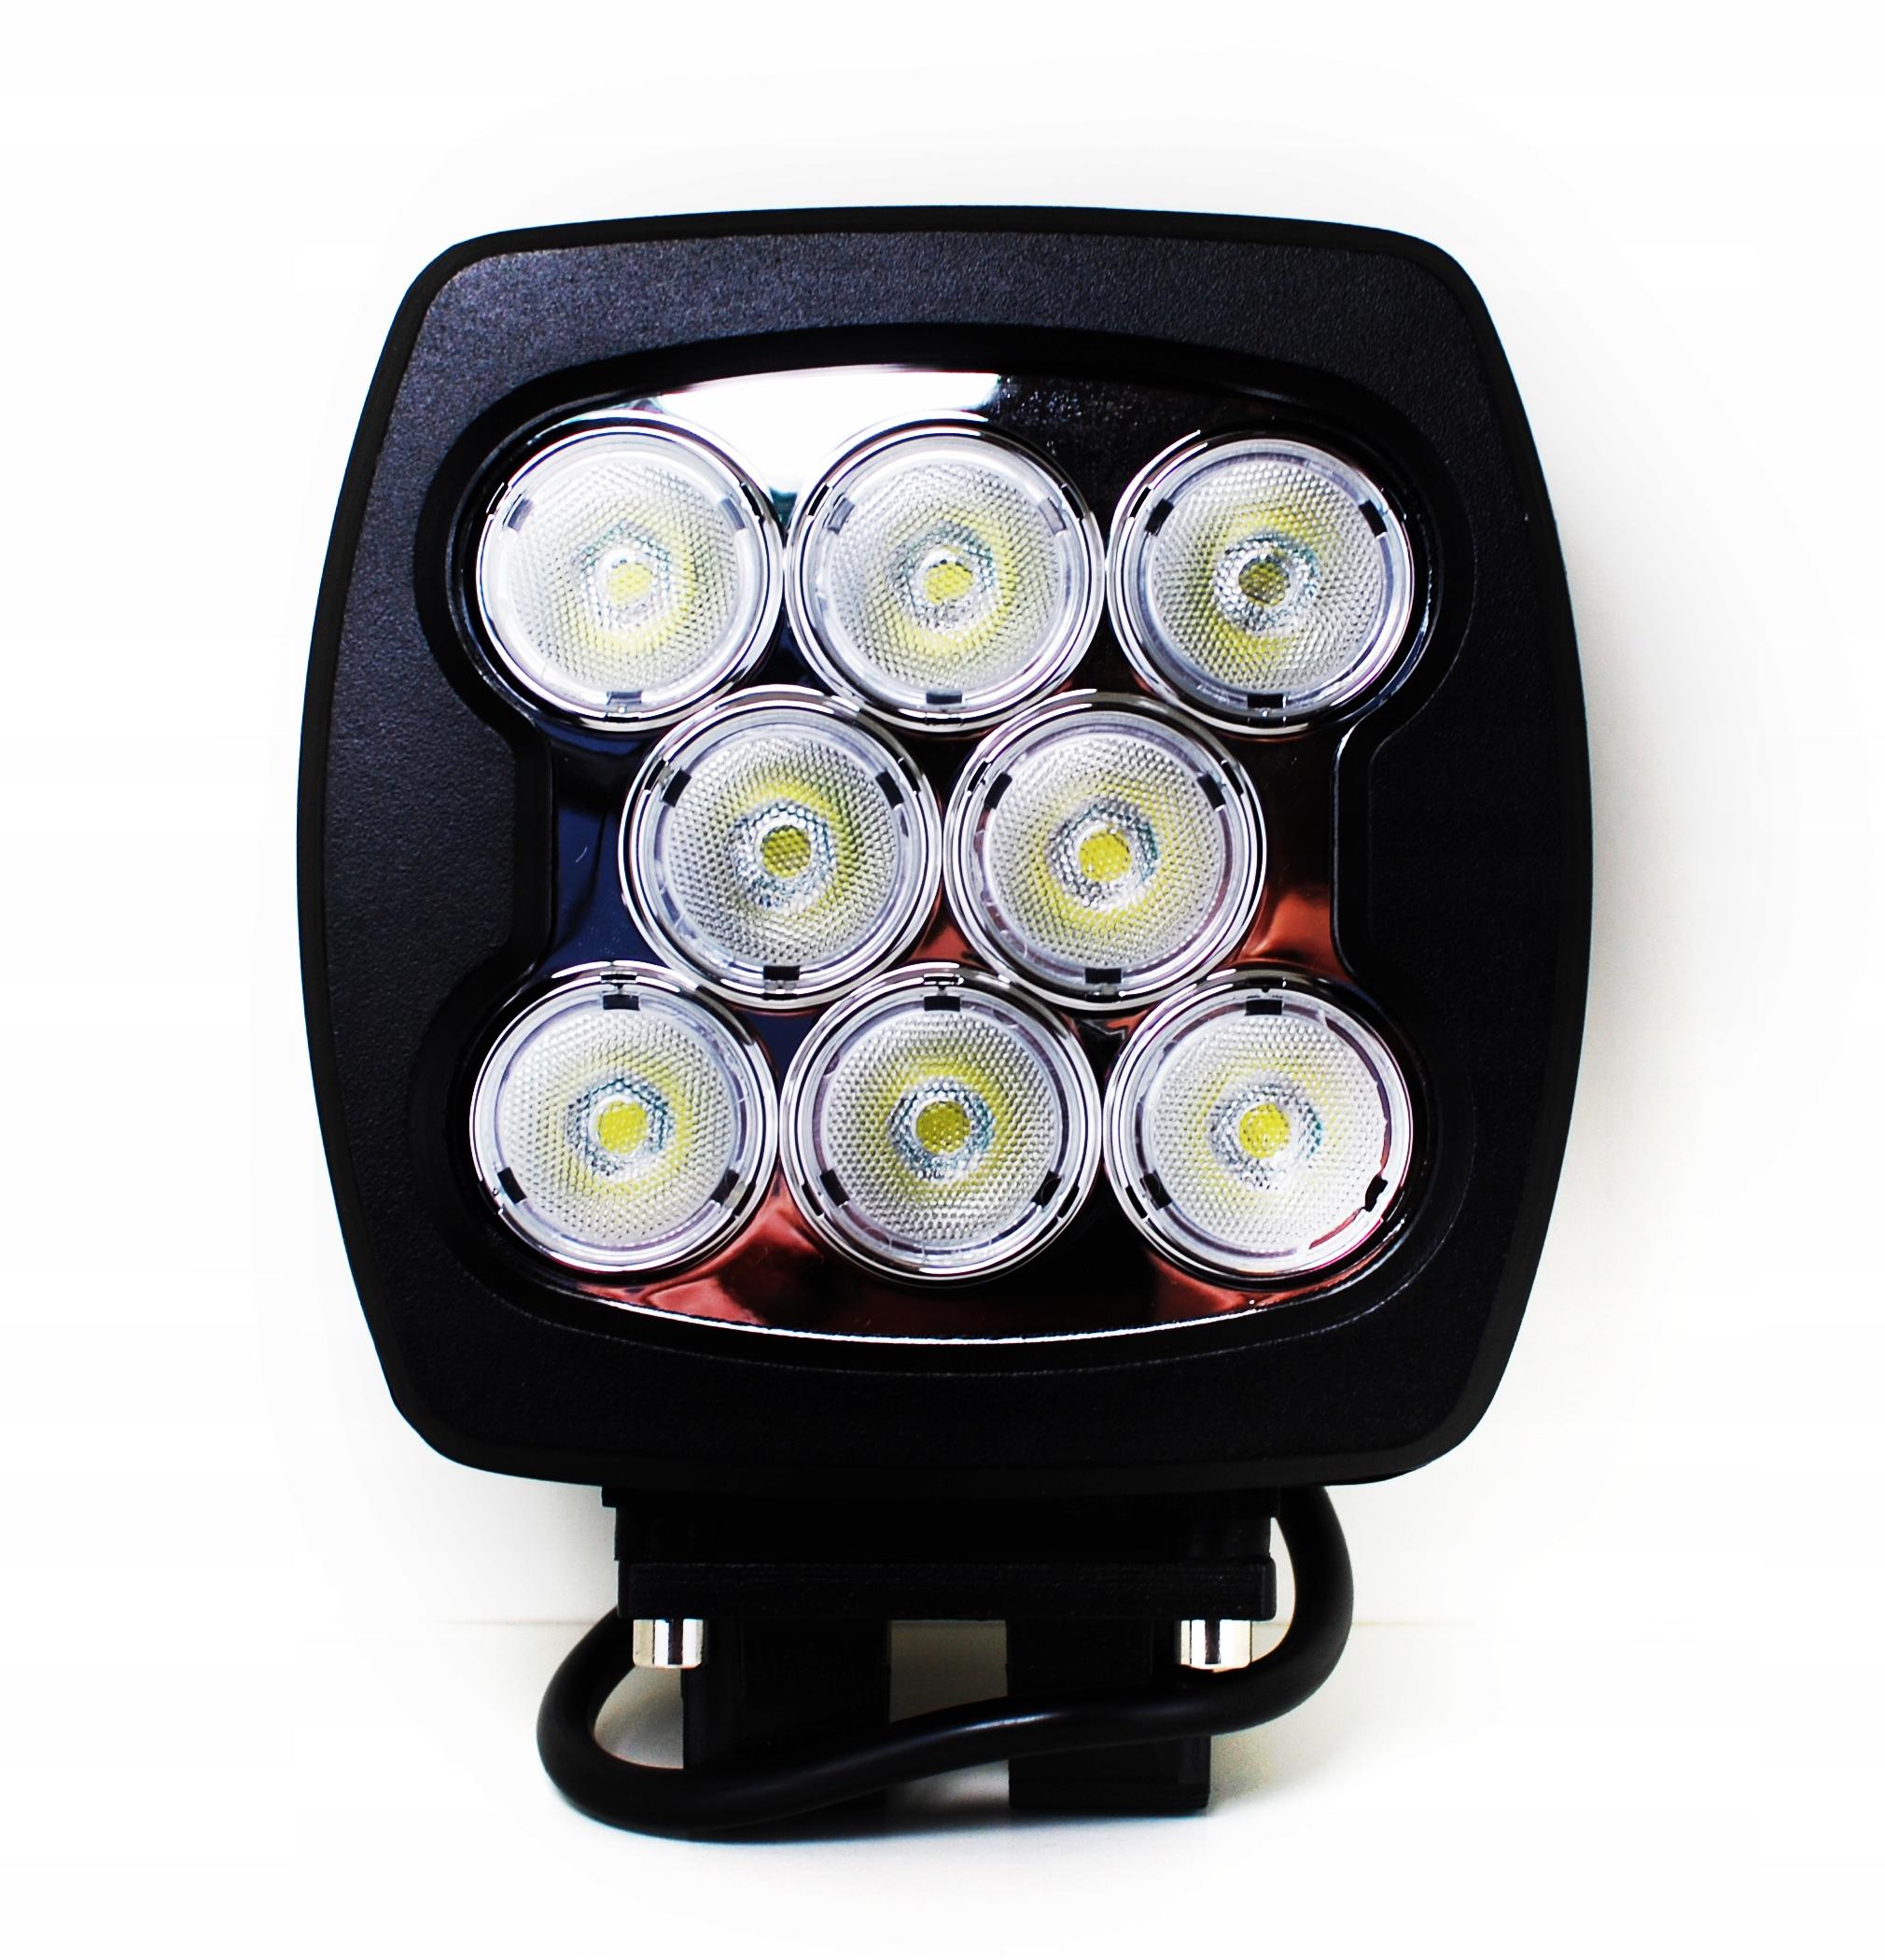 LAMPA LED ROBOCZA 8 LED 80W 10-30V DALEKOSIĘŻNA